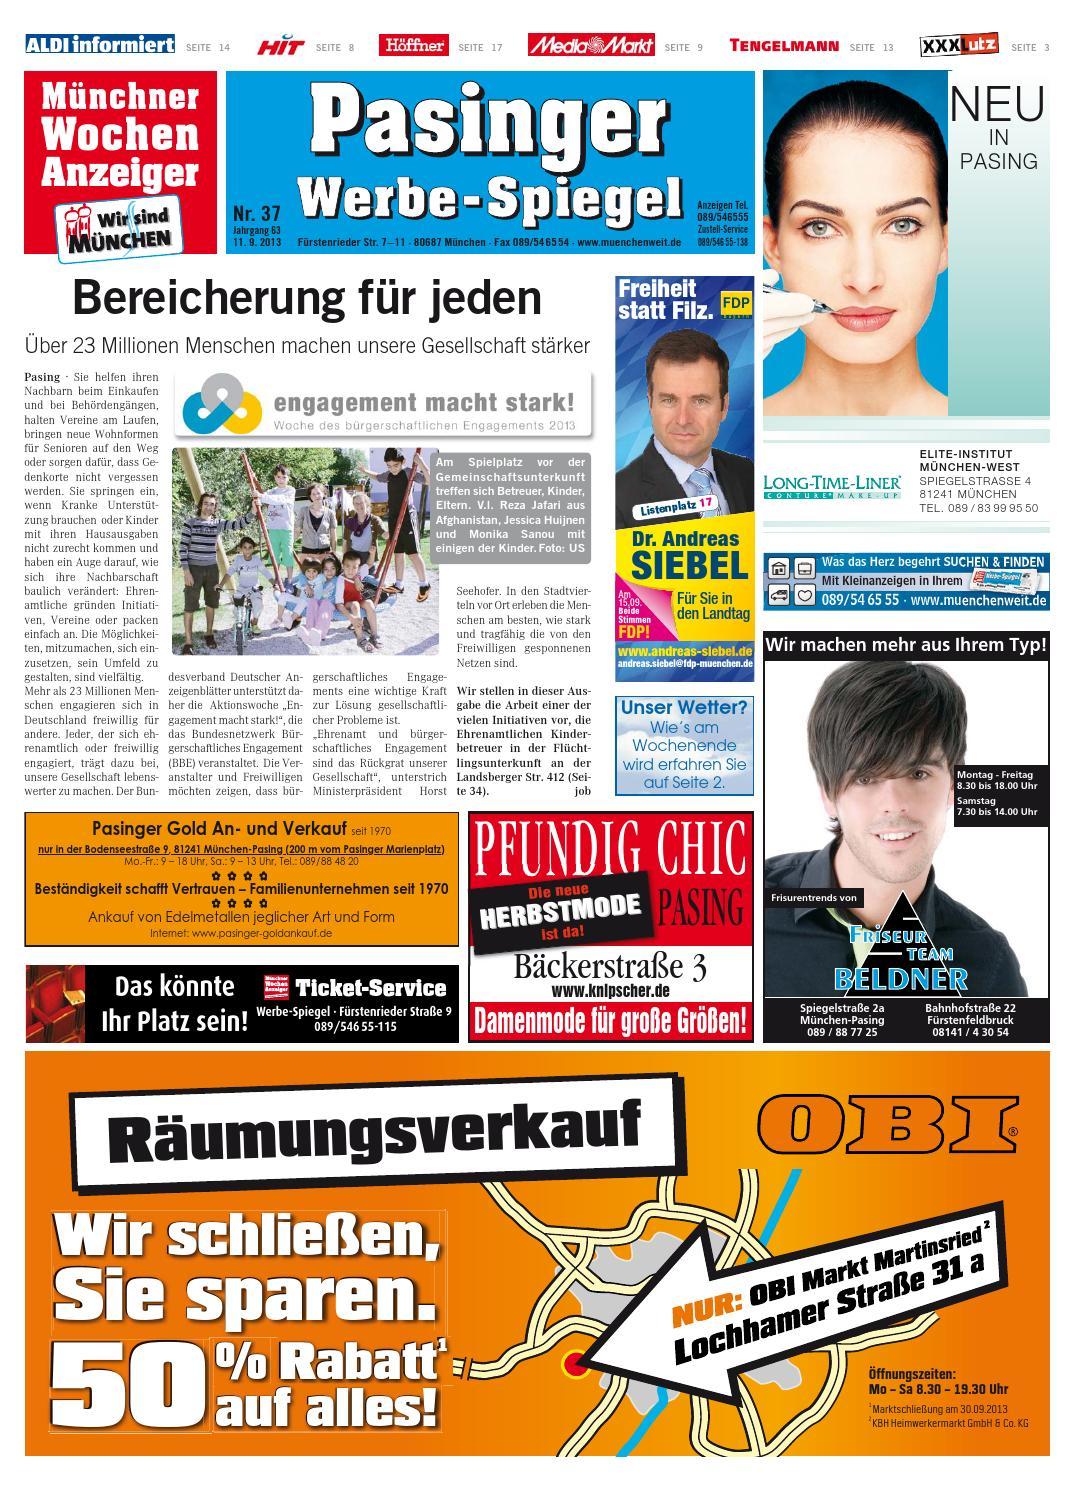 zwanglos berlin tantra regensburg